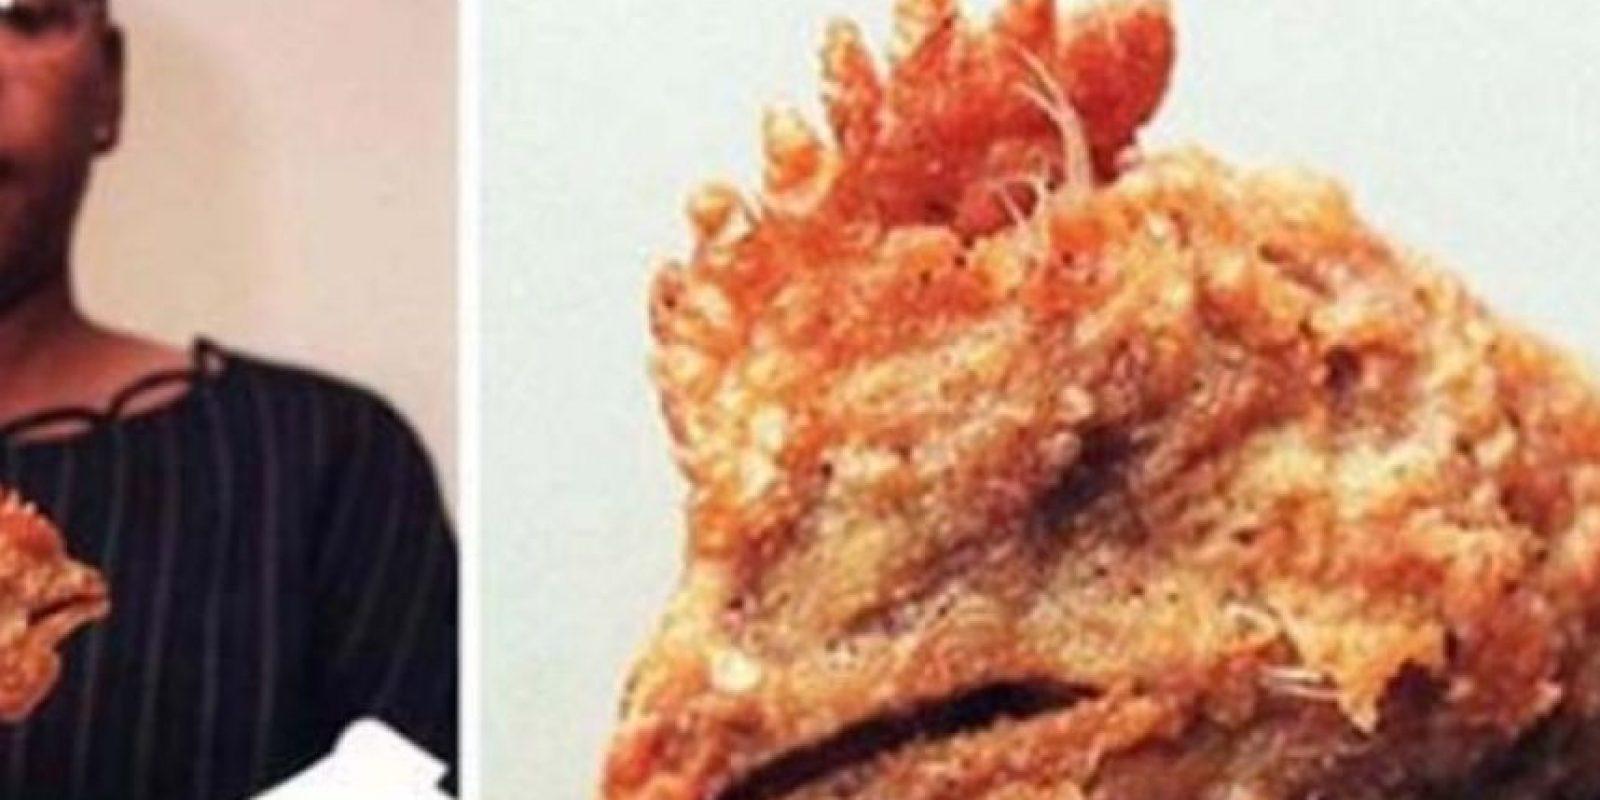 La cabeza del pobre pollo. Foto:vía Imgur